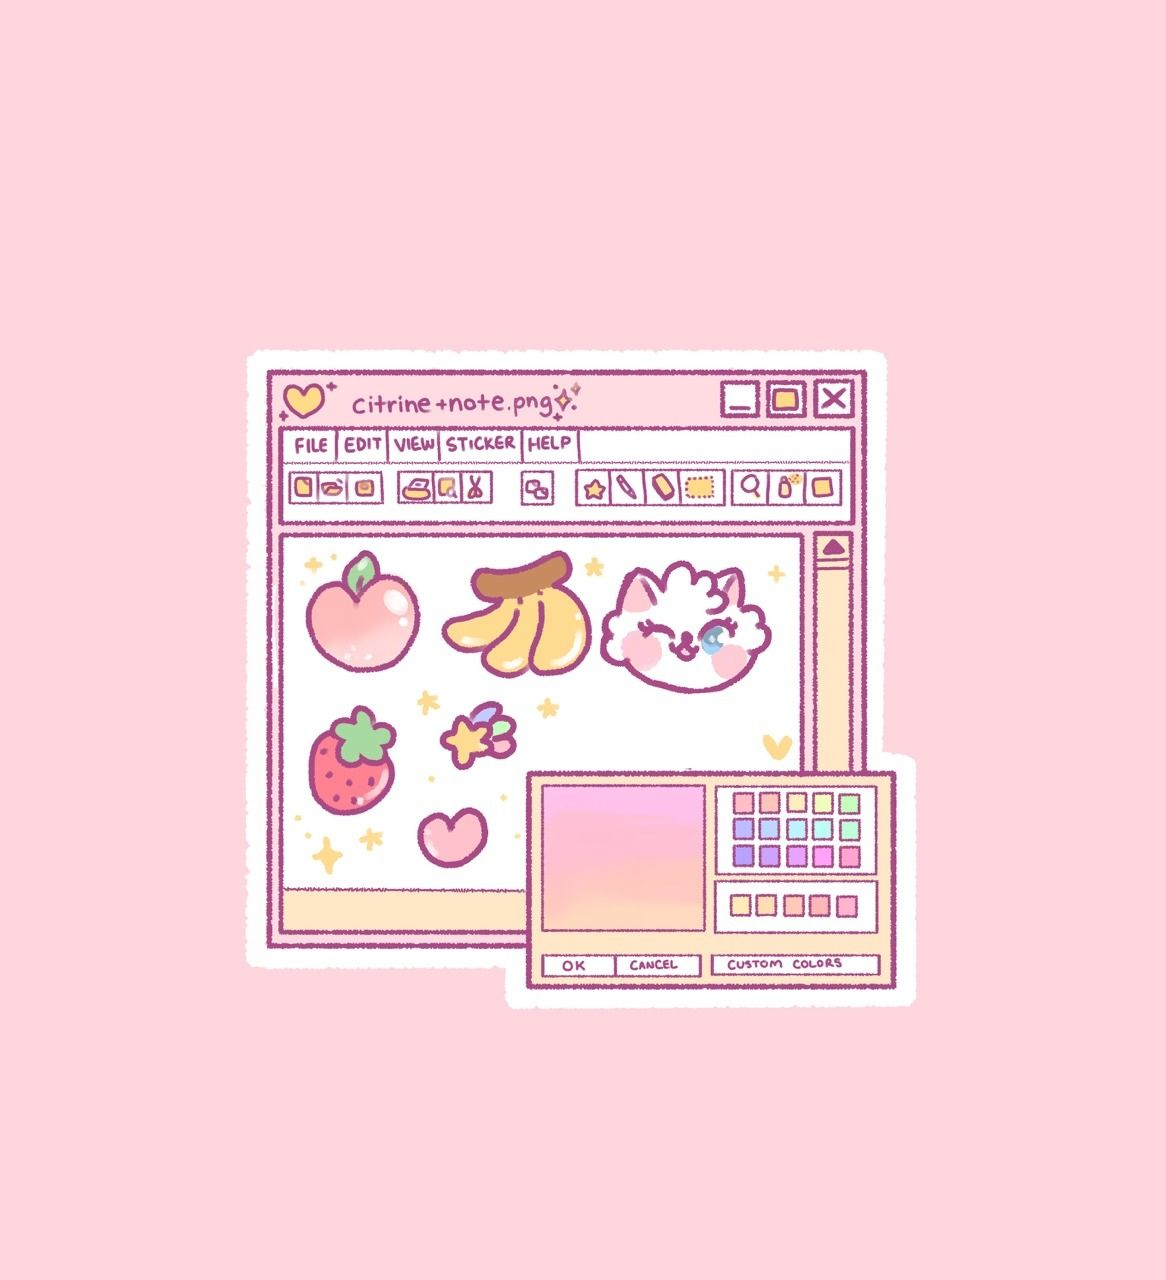 Pastel Tumblr Pastel Pink Aesthetic Kawaii Wallpaper Wallpaper Iphone Cute